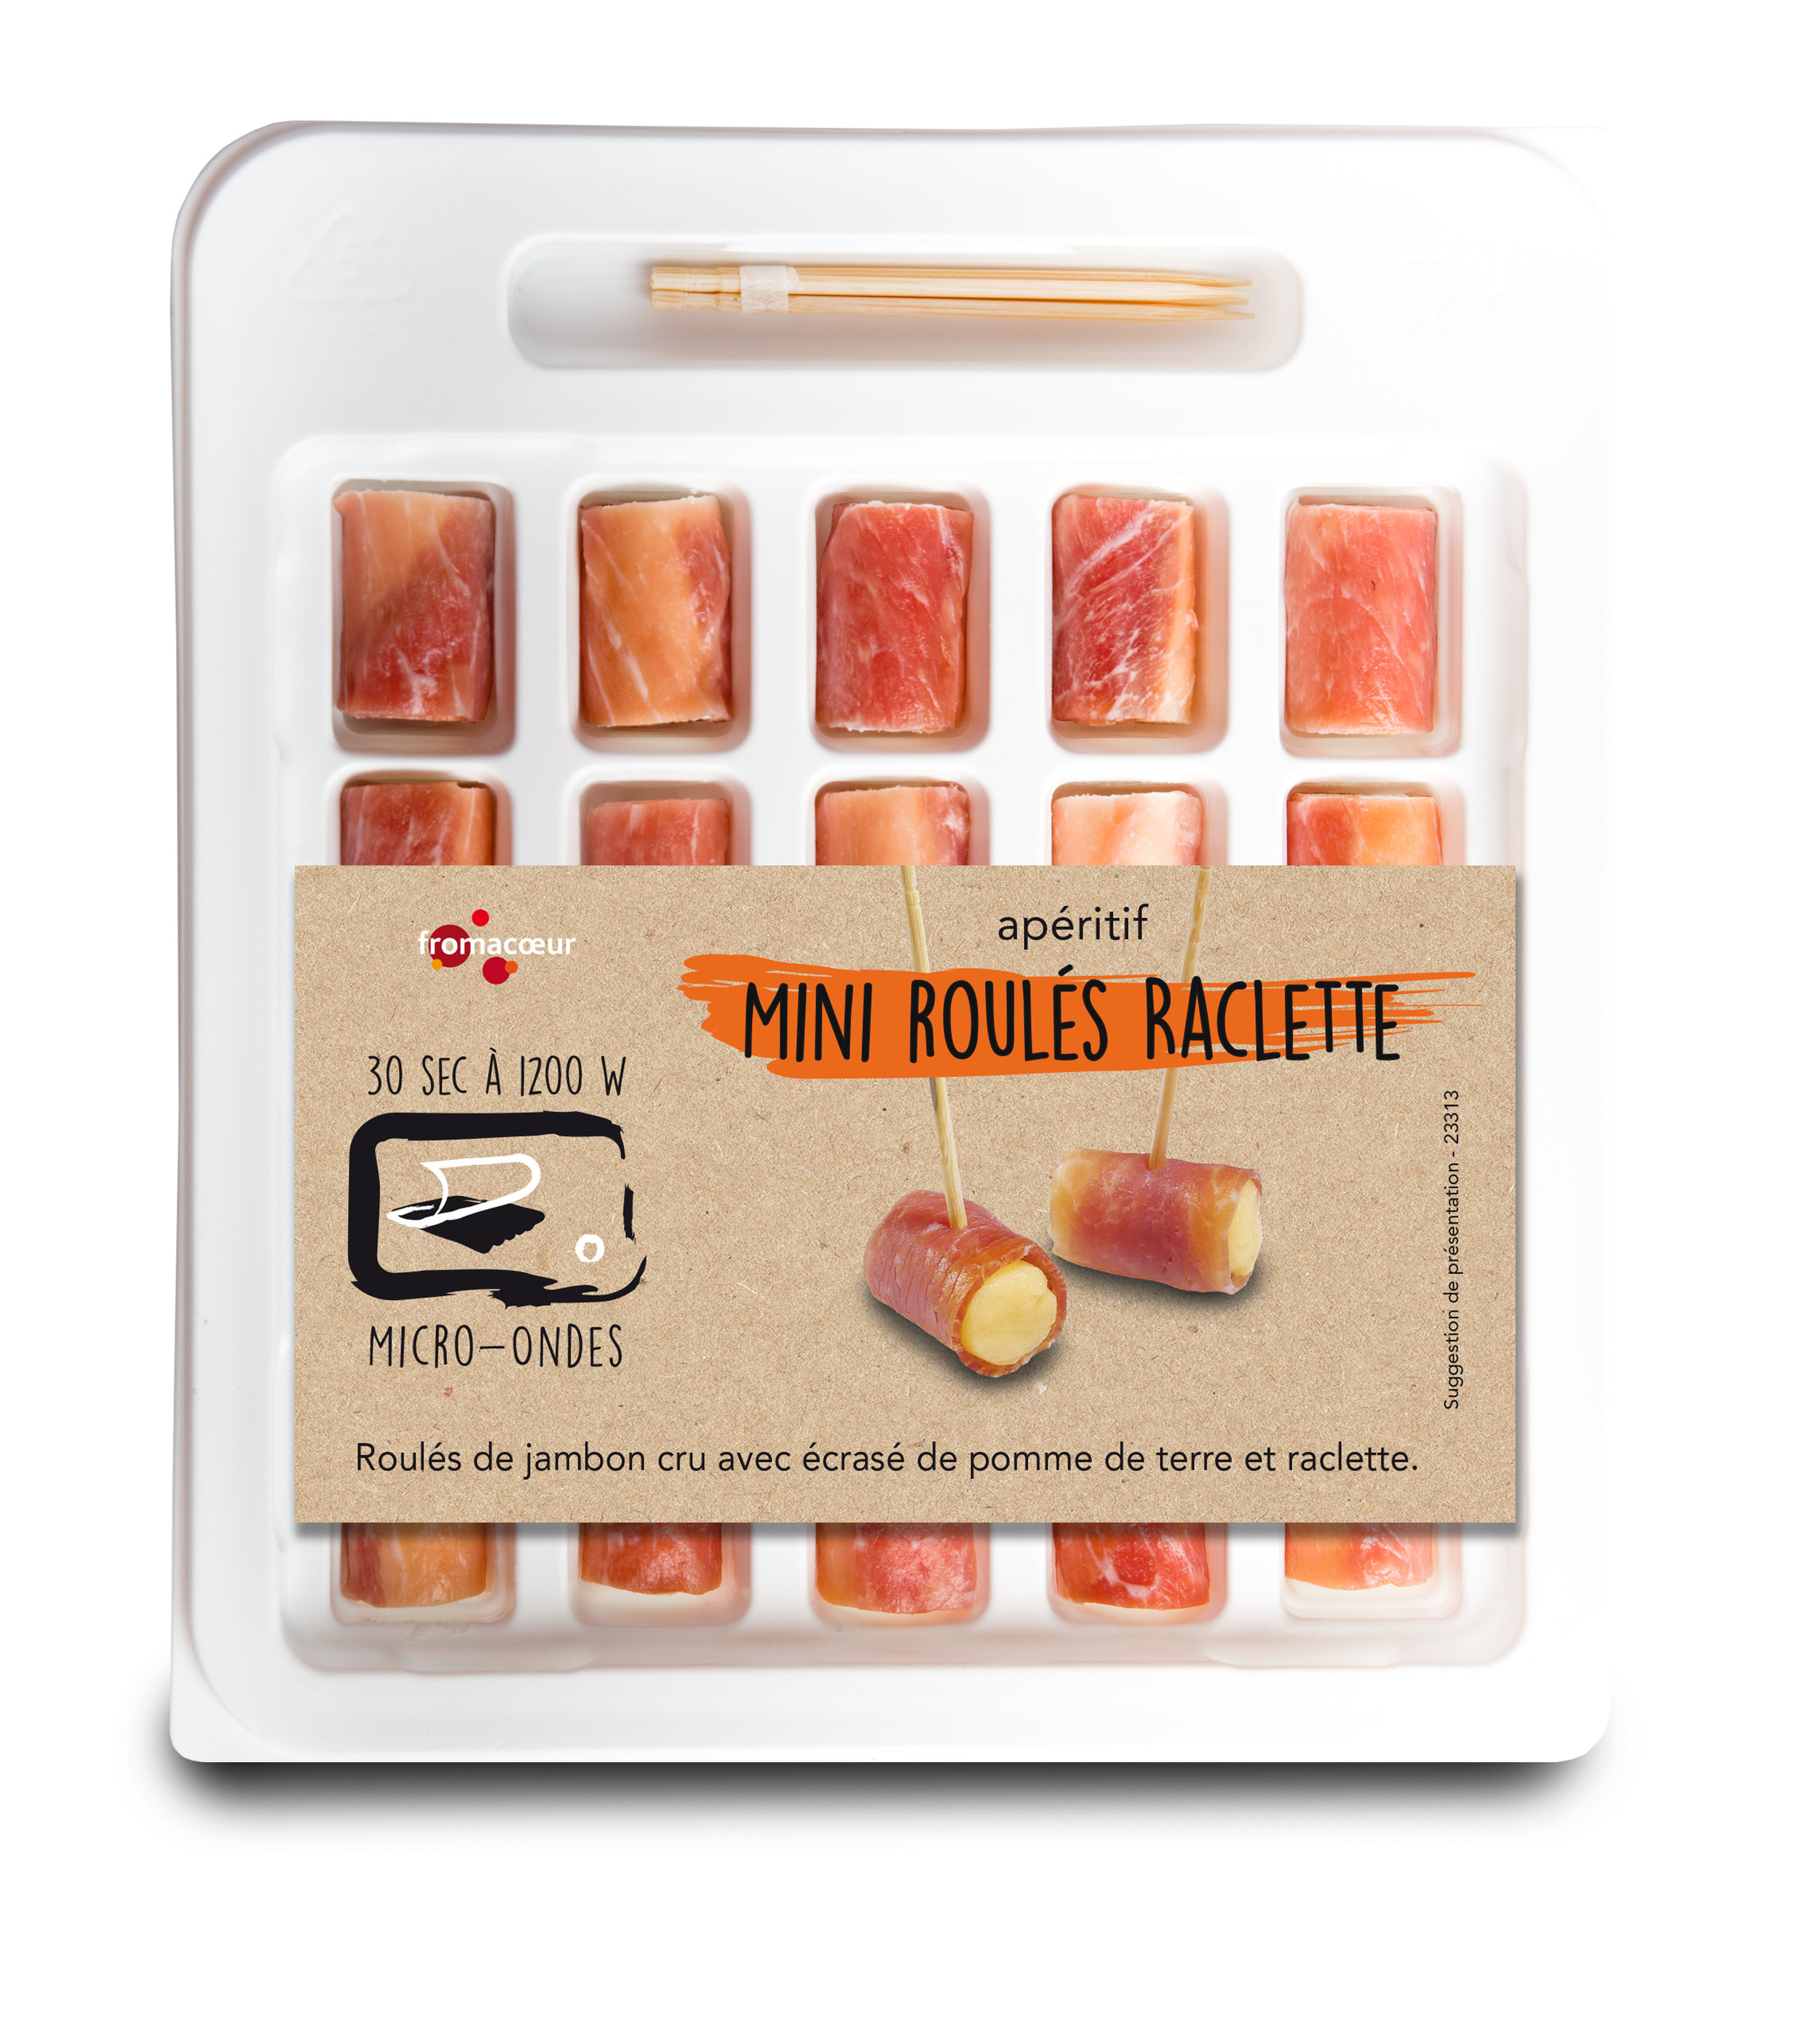 Mini roulés raclette.jpg